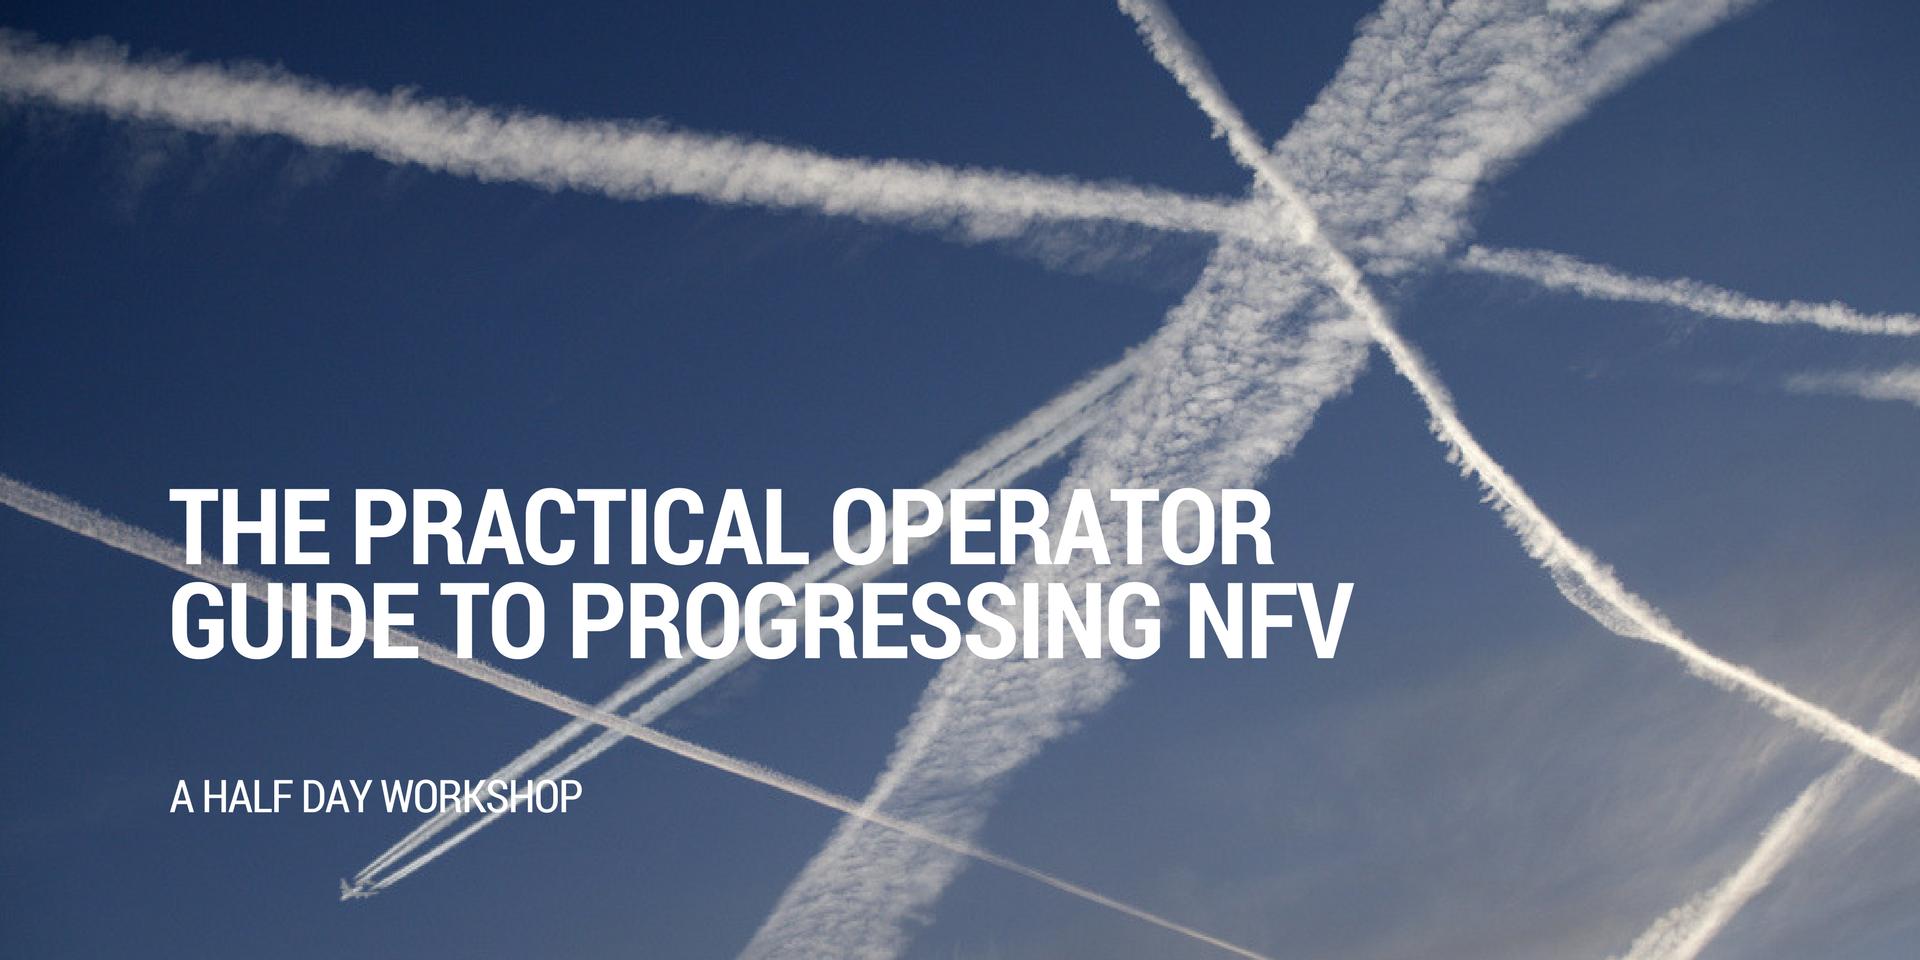 The NFV Operator Workshop